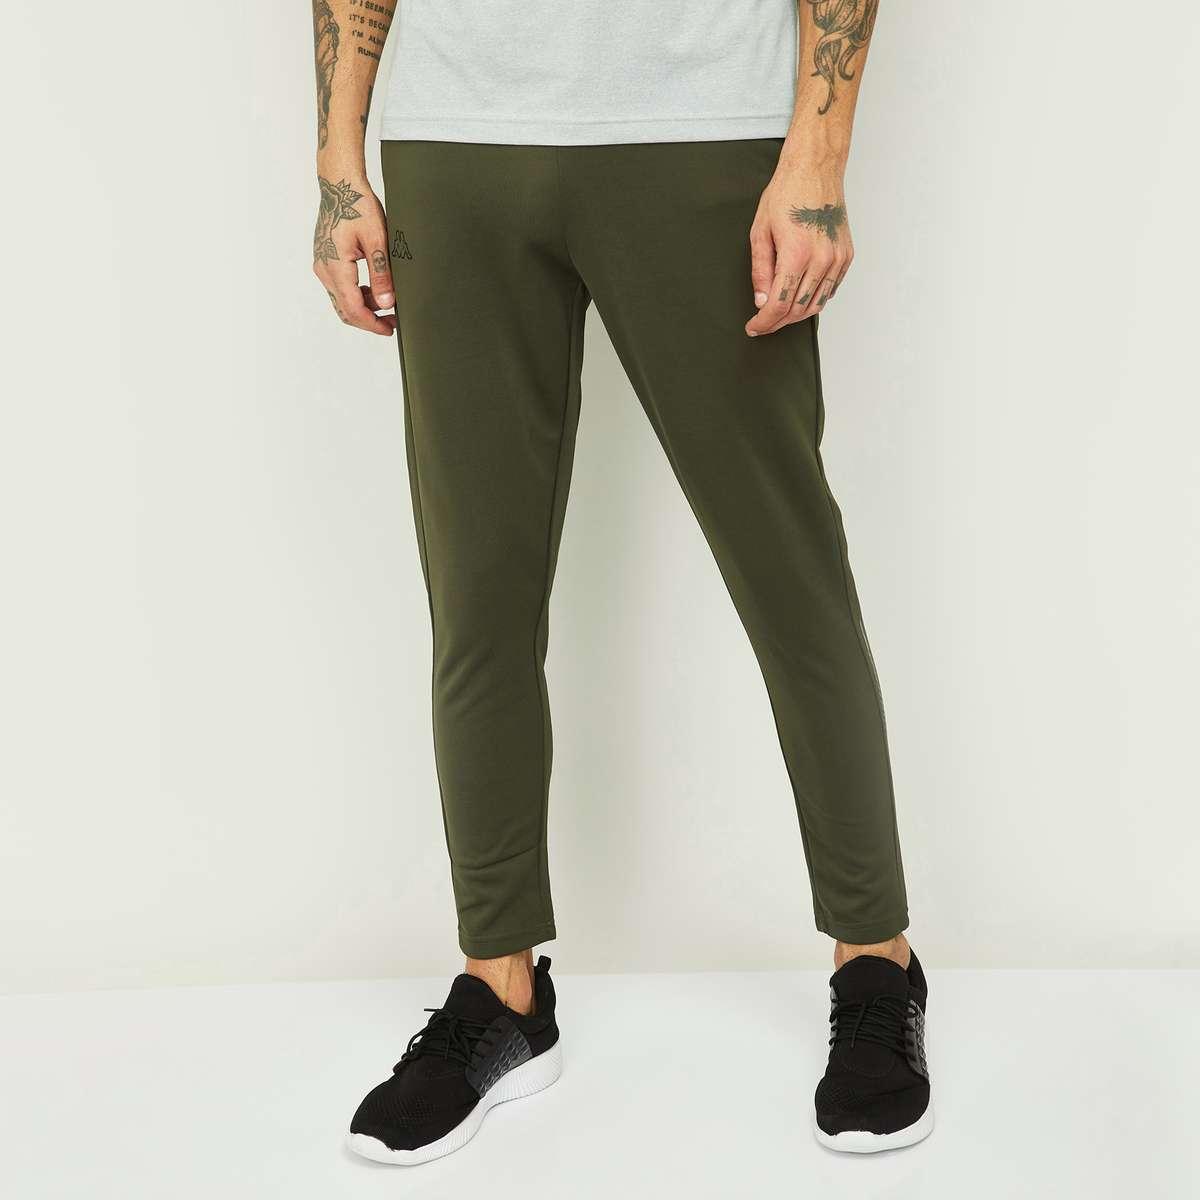 5.KAPPA Men Solid Slim Fit Track Pants